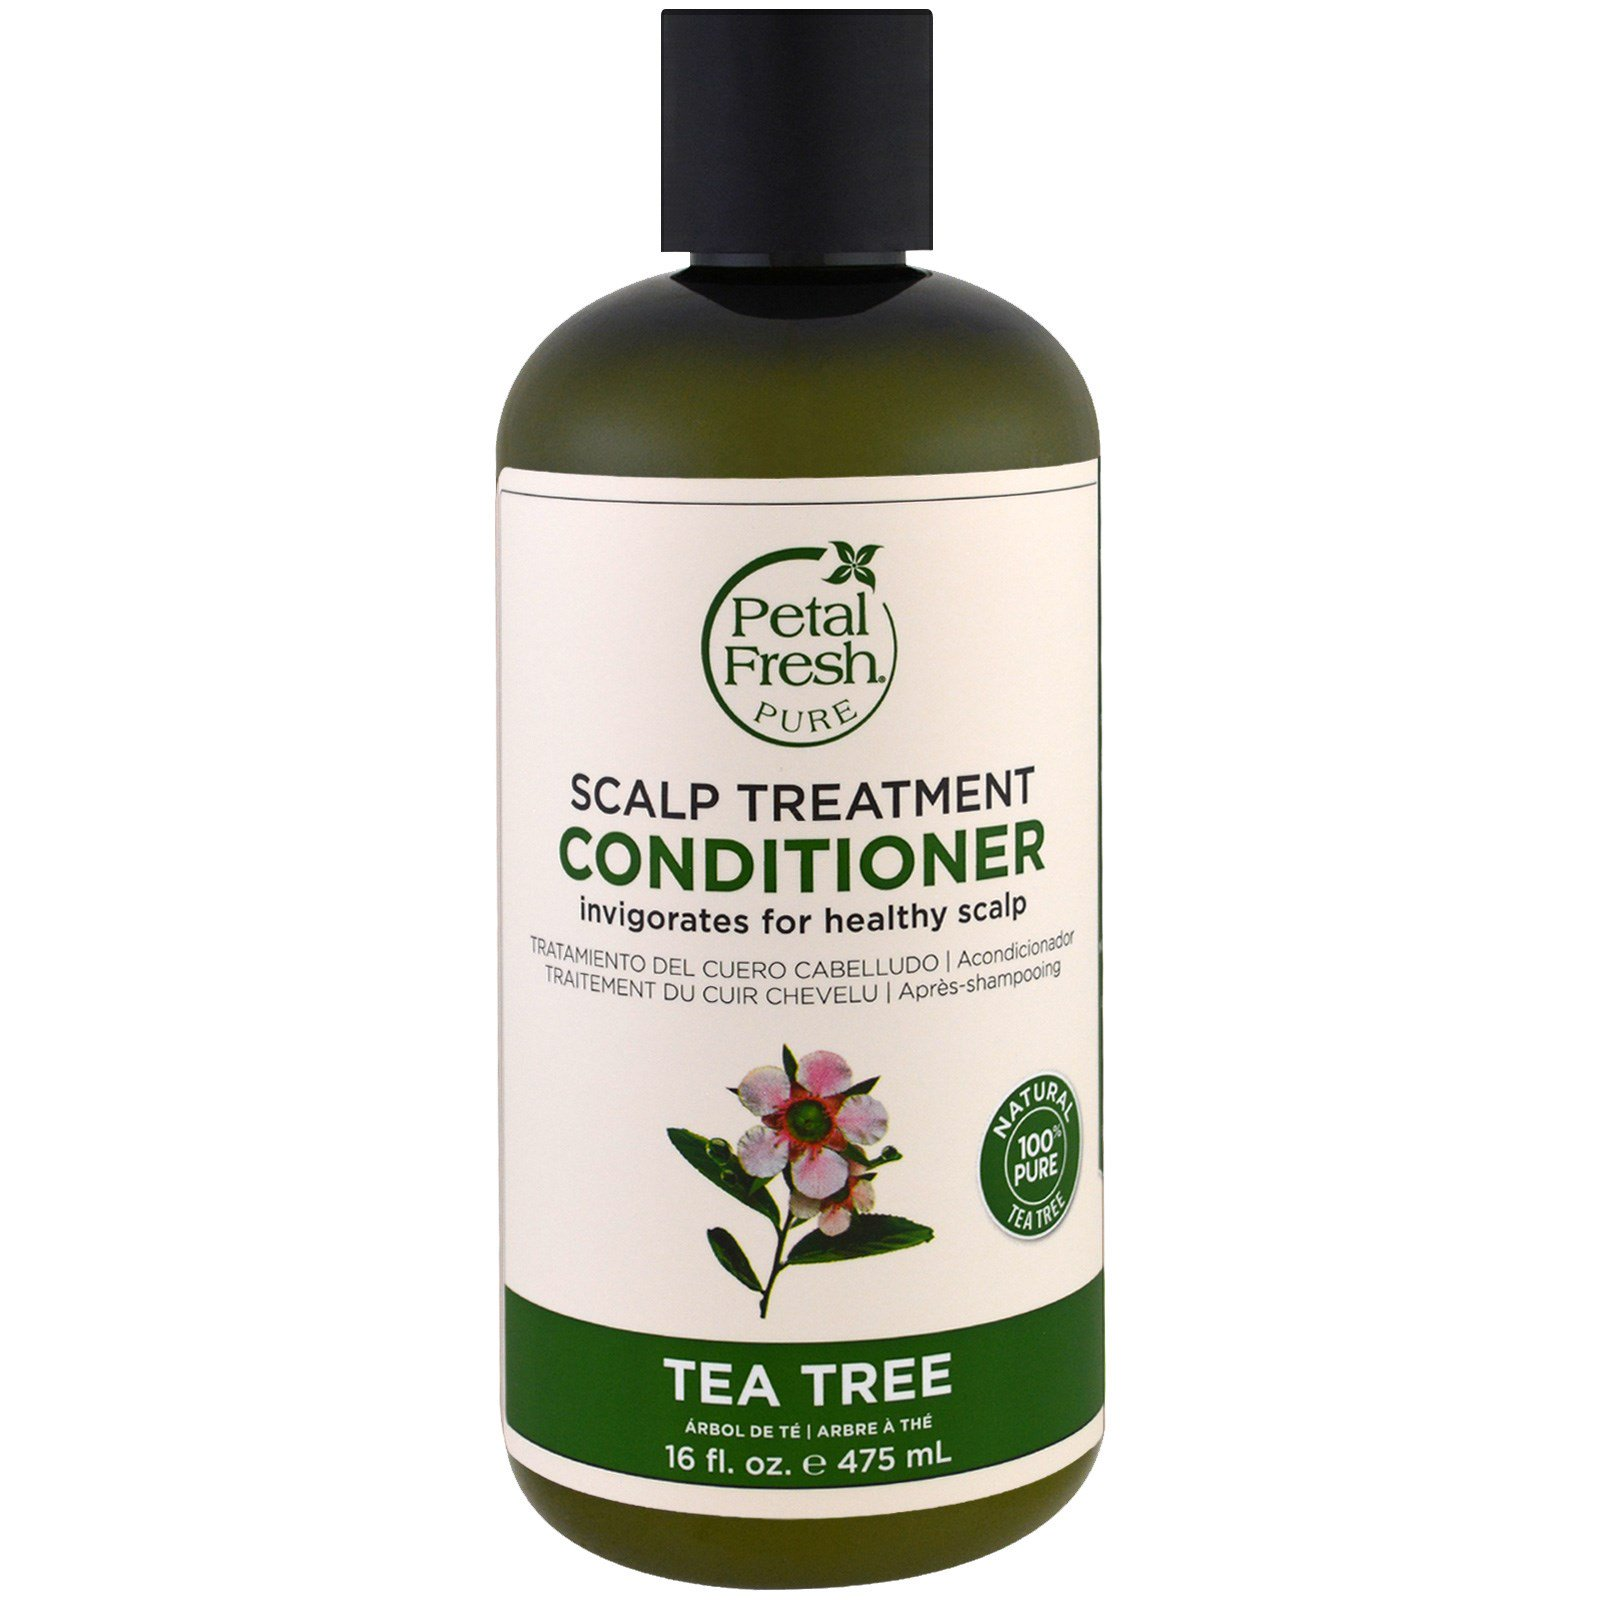 Petal Fresh, Pure, Conditioner, Scalp Treatment, Tea Tree, 16 fl oz (475 ml)